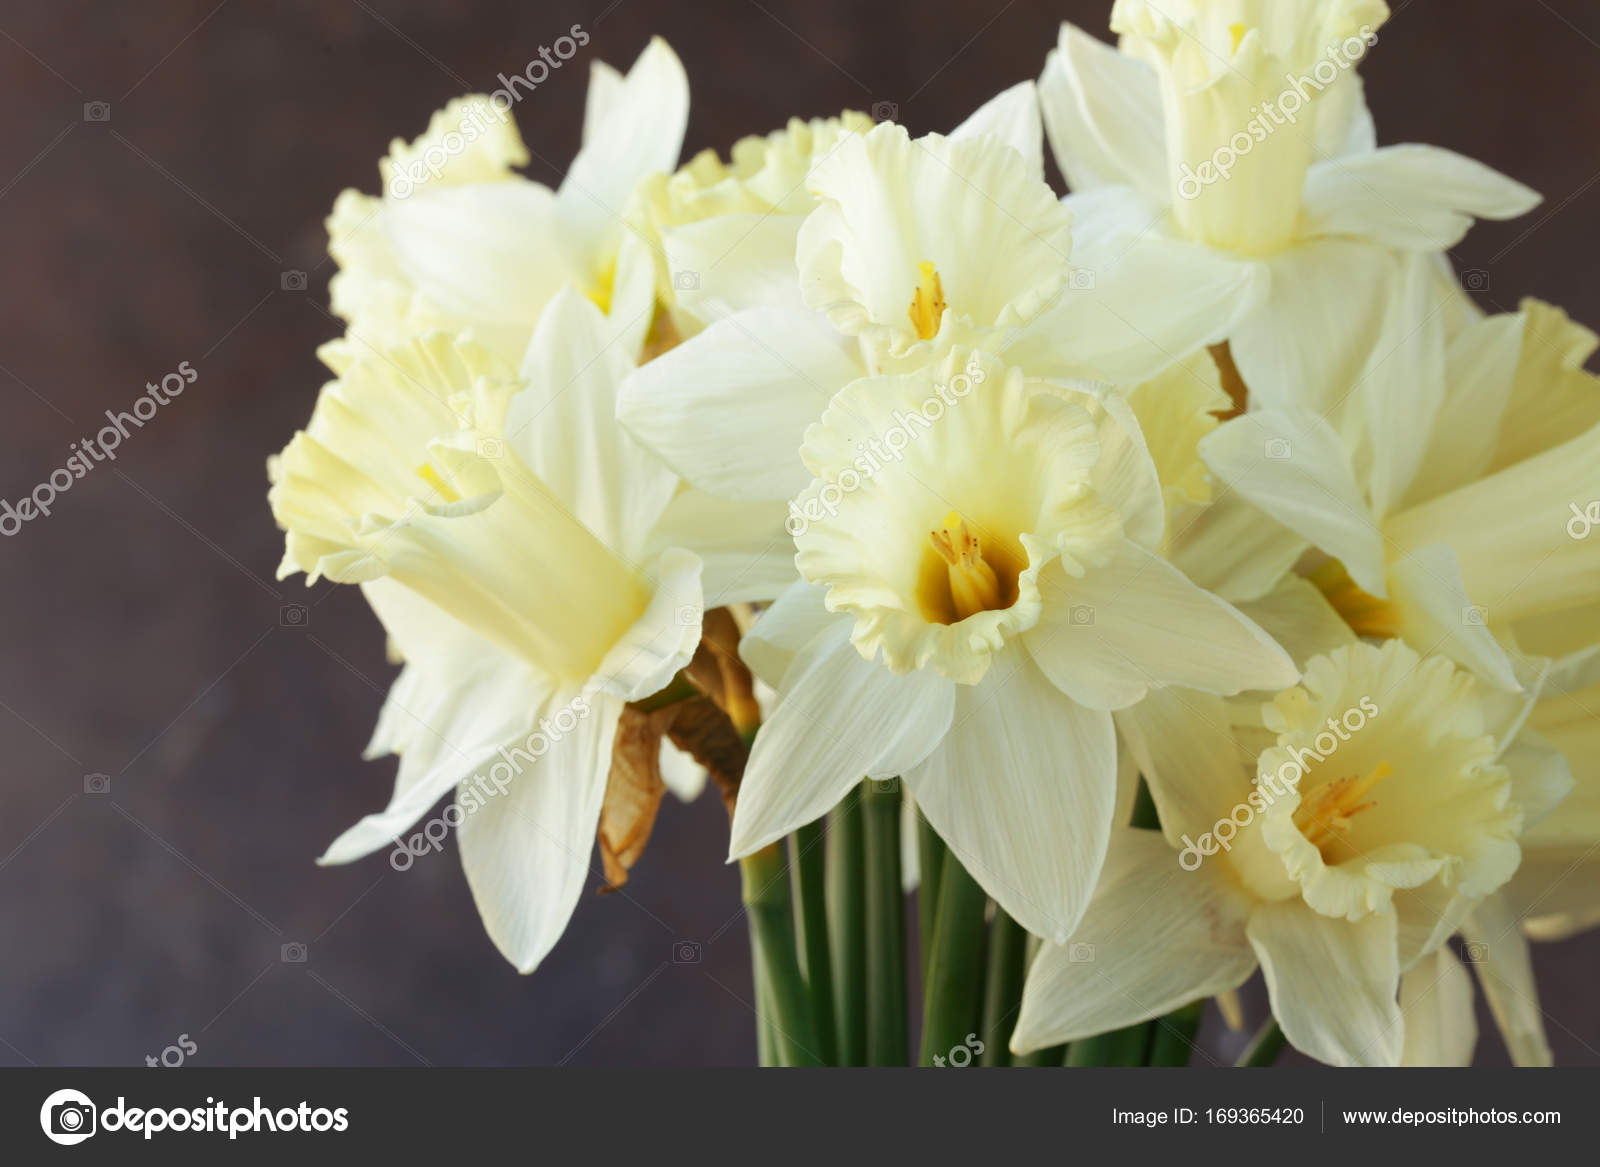 Fresh yellow daffodil flowers symbol of spring stock photo fresh yellow daffodil flowers symbol of spring stock photo mightylinksfo